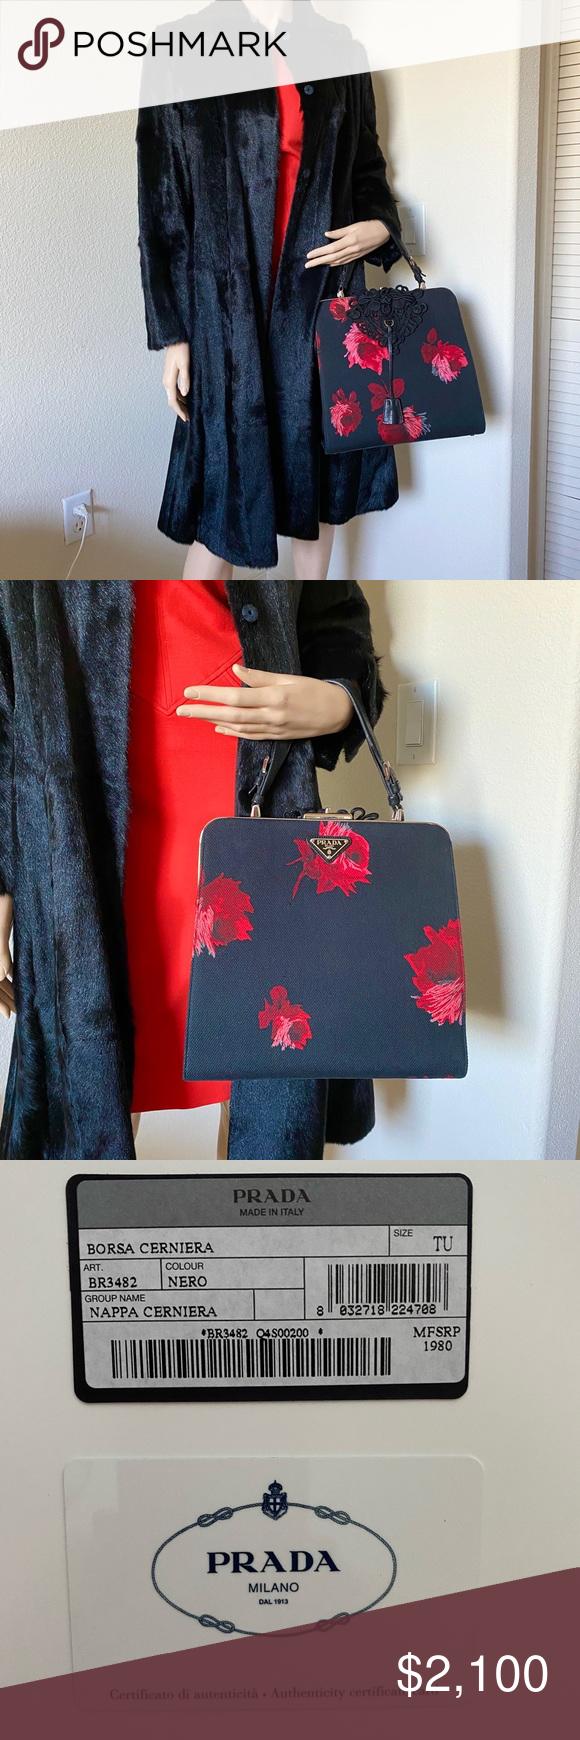 Photo of PRADA Vintage Nappa Cerniera Handbag This vintage rare Prada handbag made of har…